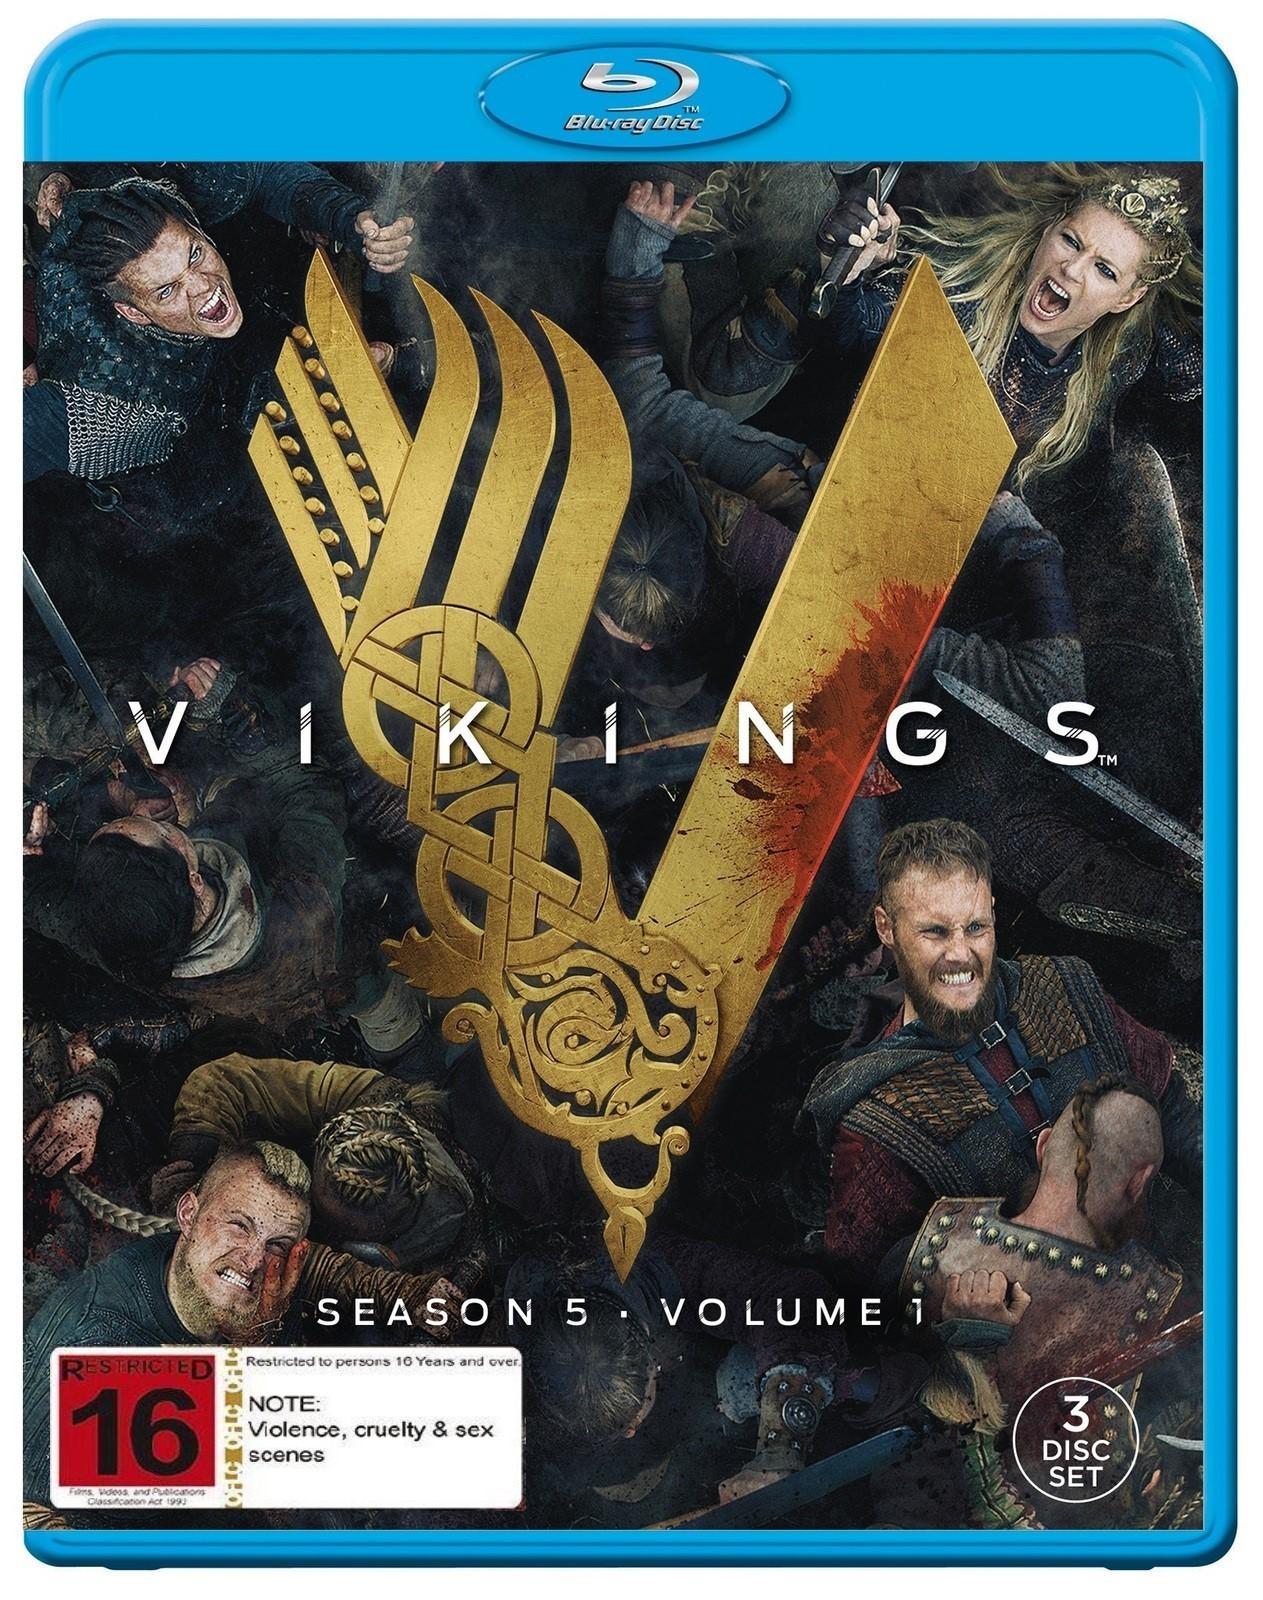 Vikings - Season 5 Volume 1 on Blu-ray image